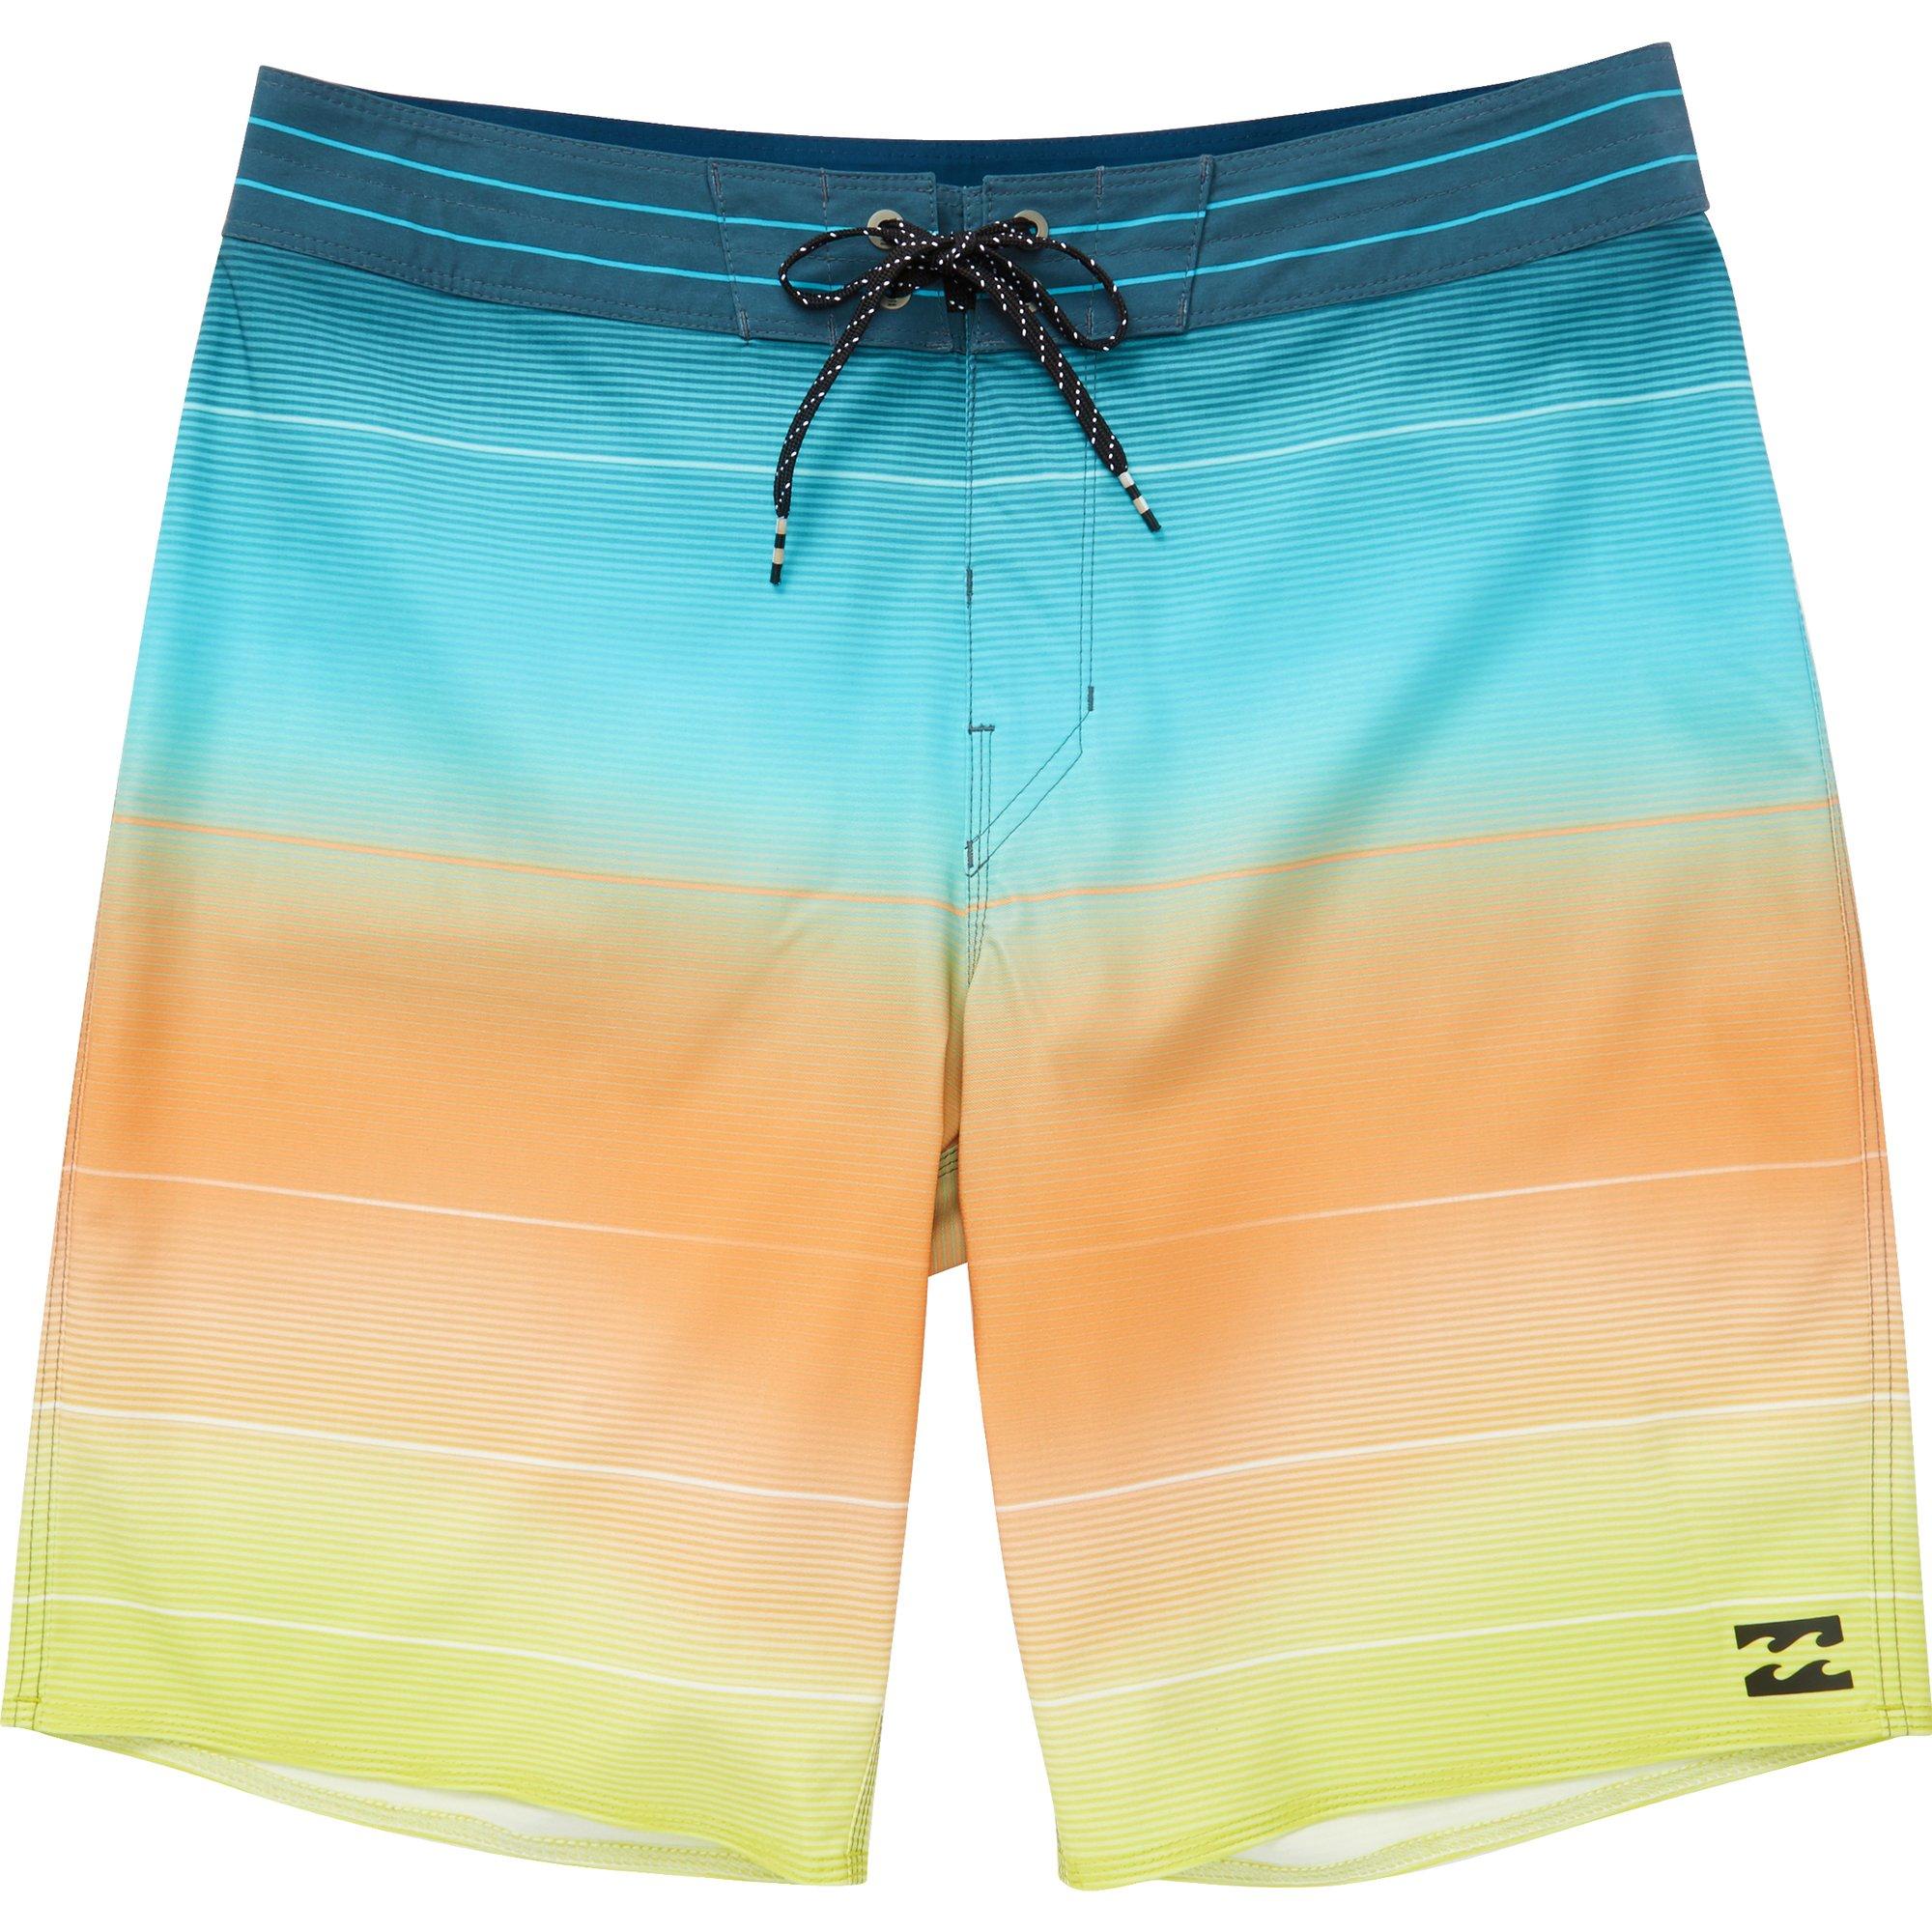 Billabong Men's Fluid Airlite Boardshorts Mint 28